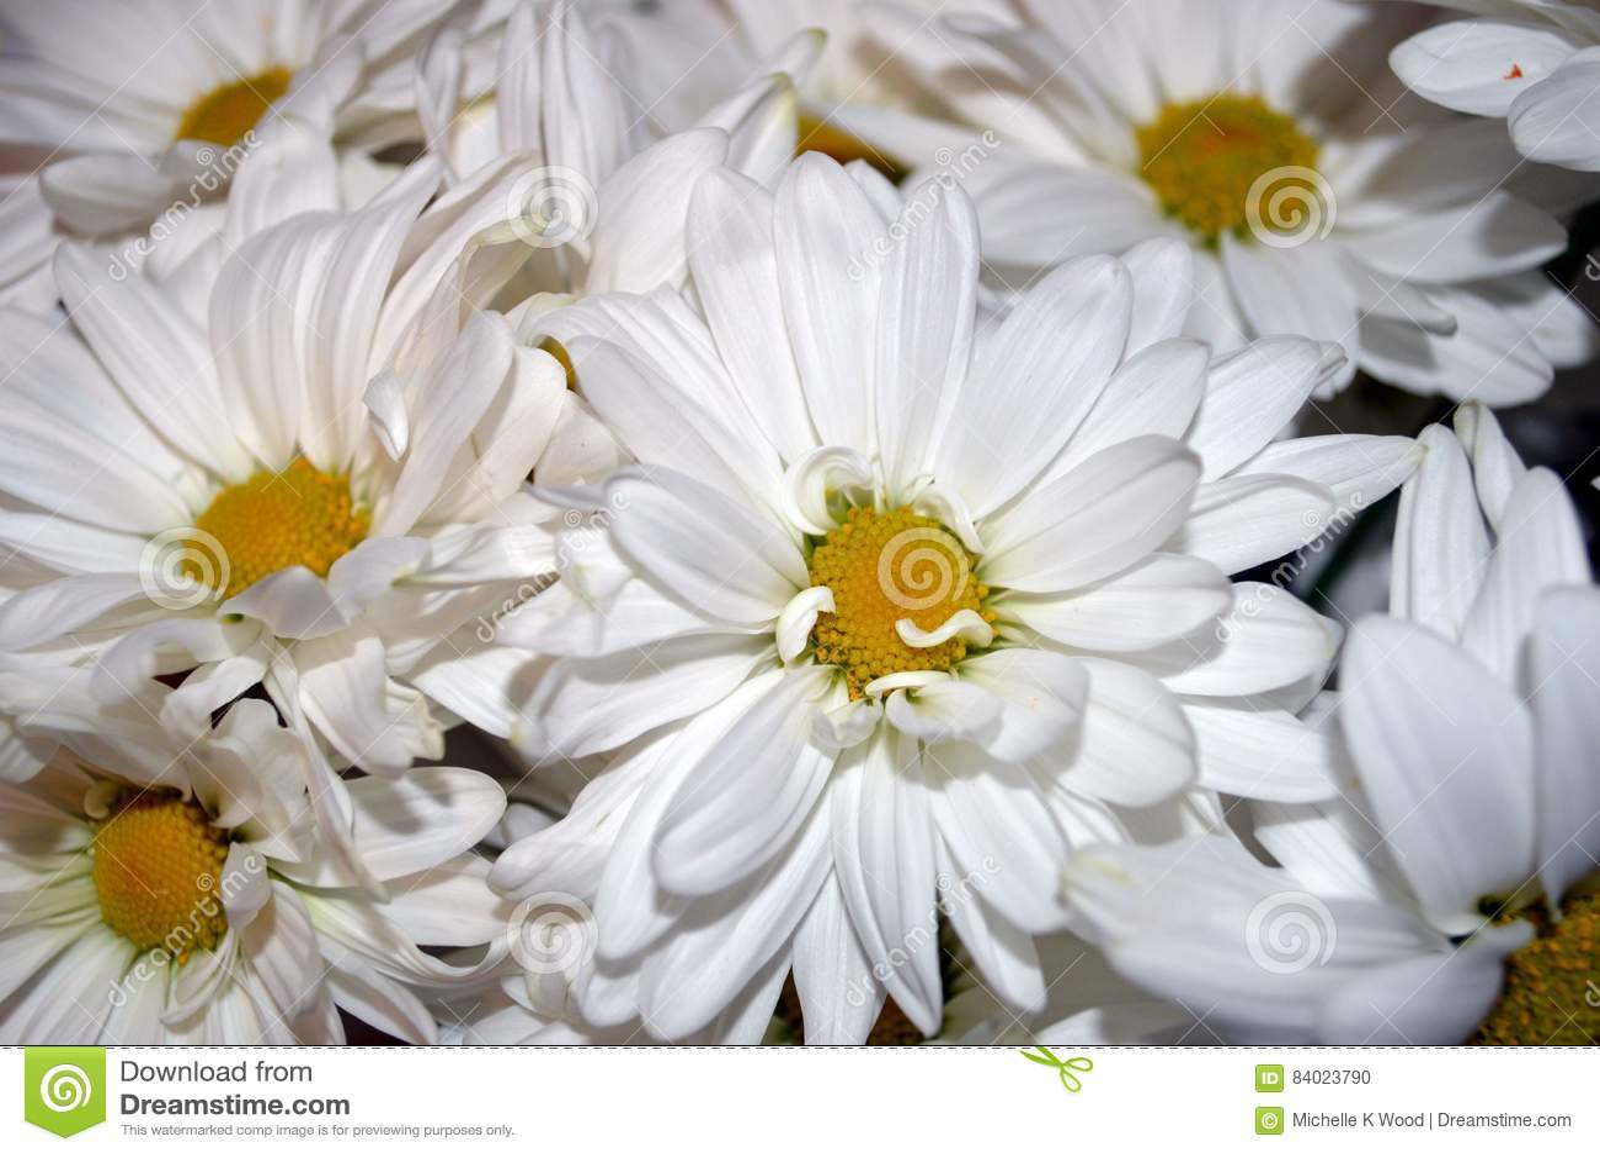 White Double Daisy Close Up Stock Photo Image Of Yellow